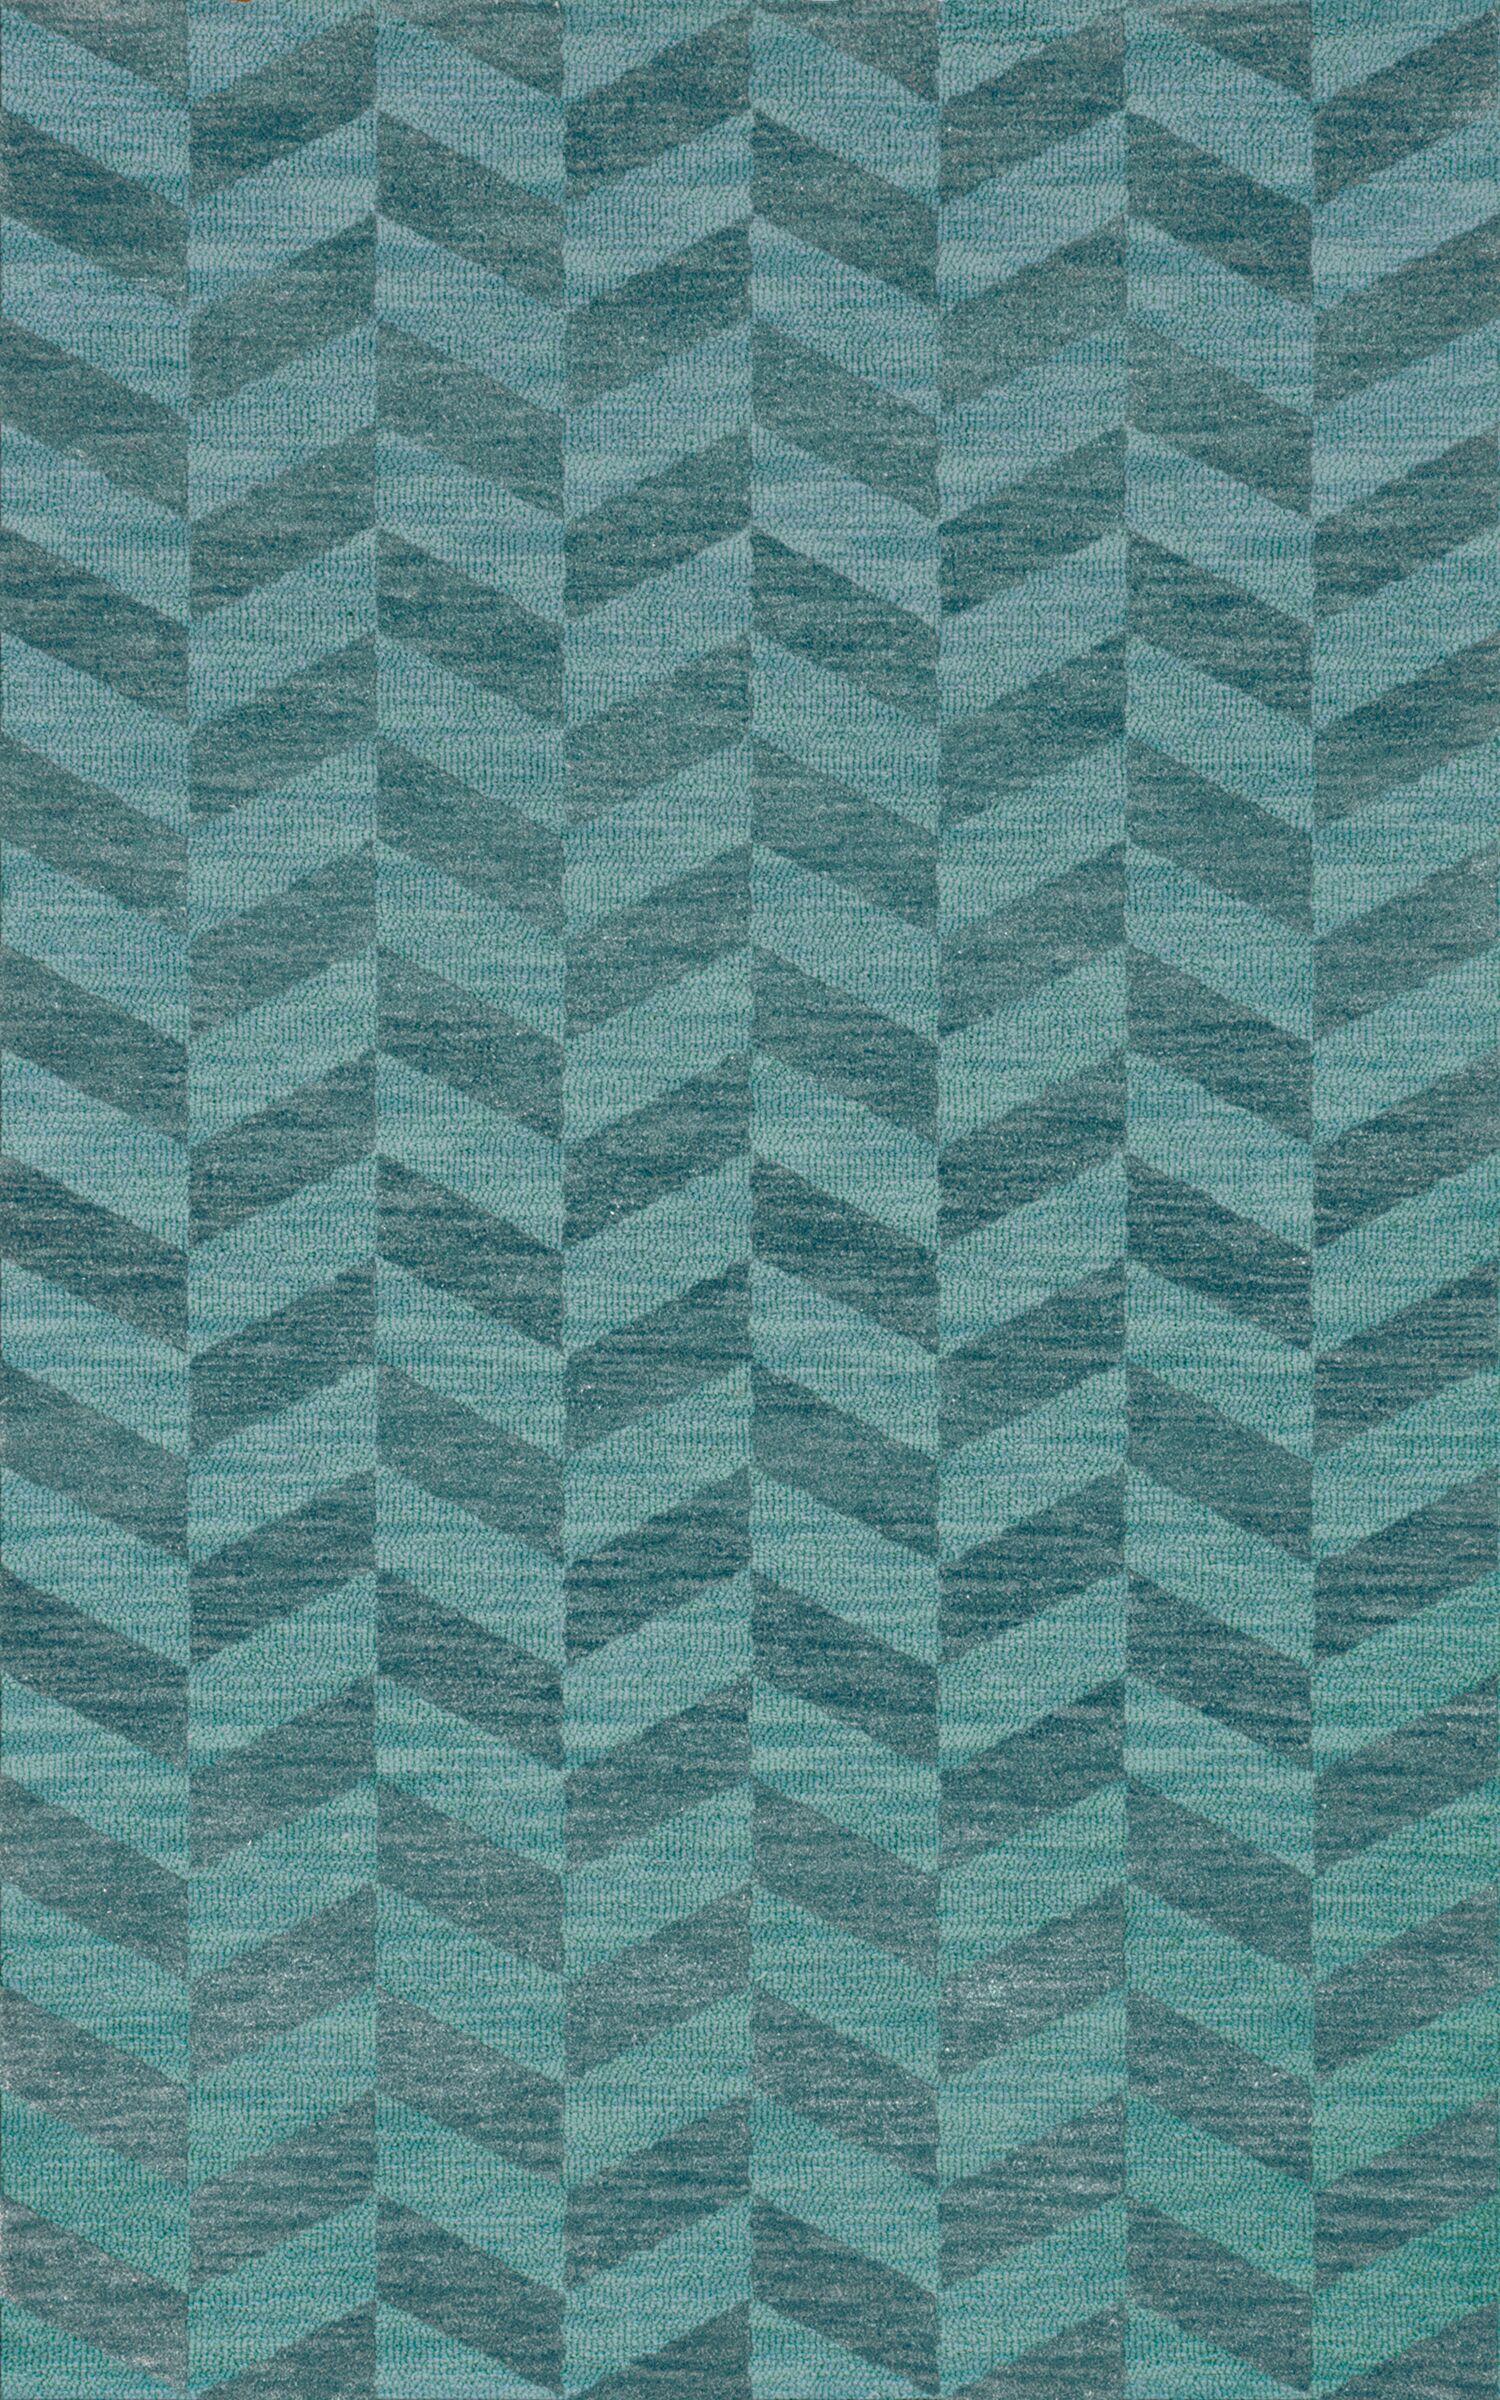 Bella Machine Woven Wool Blue Area Rug Rug Size: Rectangle 3' x 5'